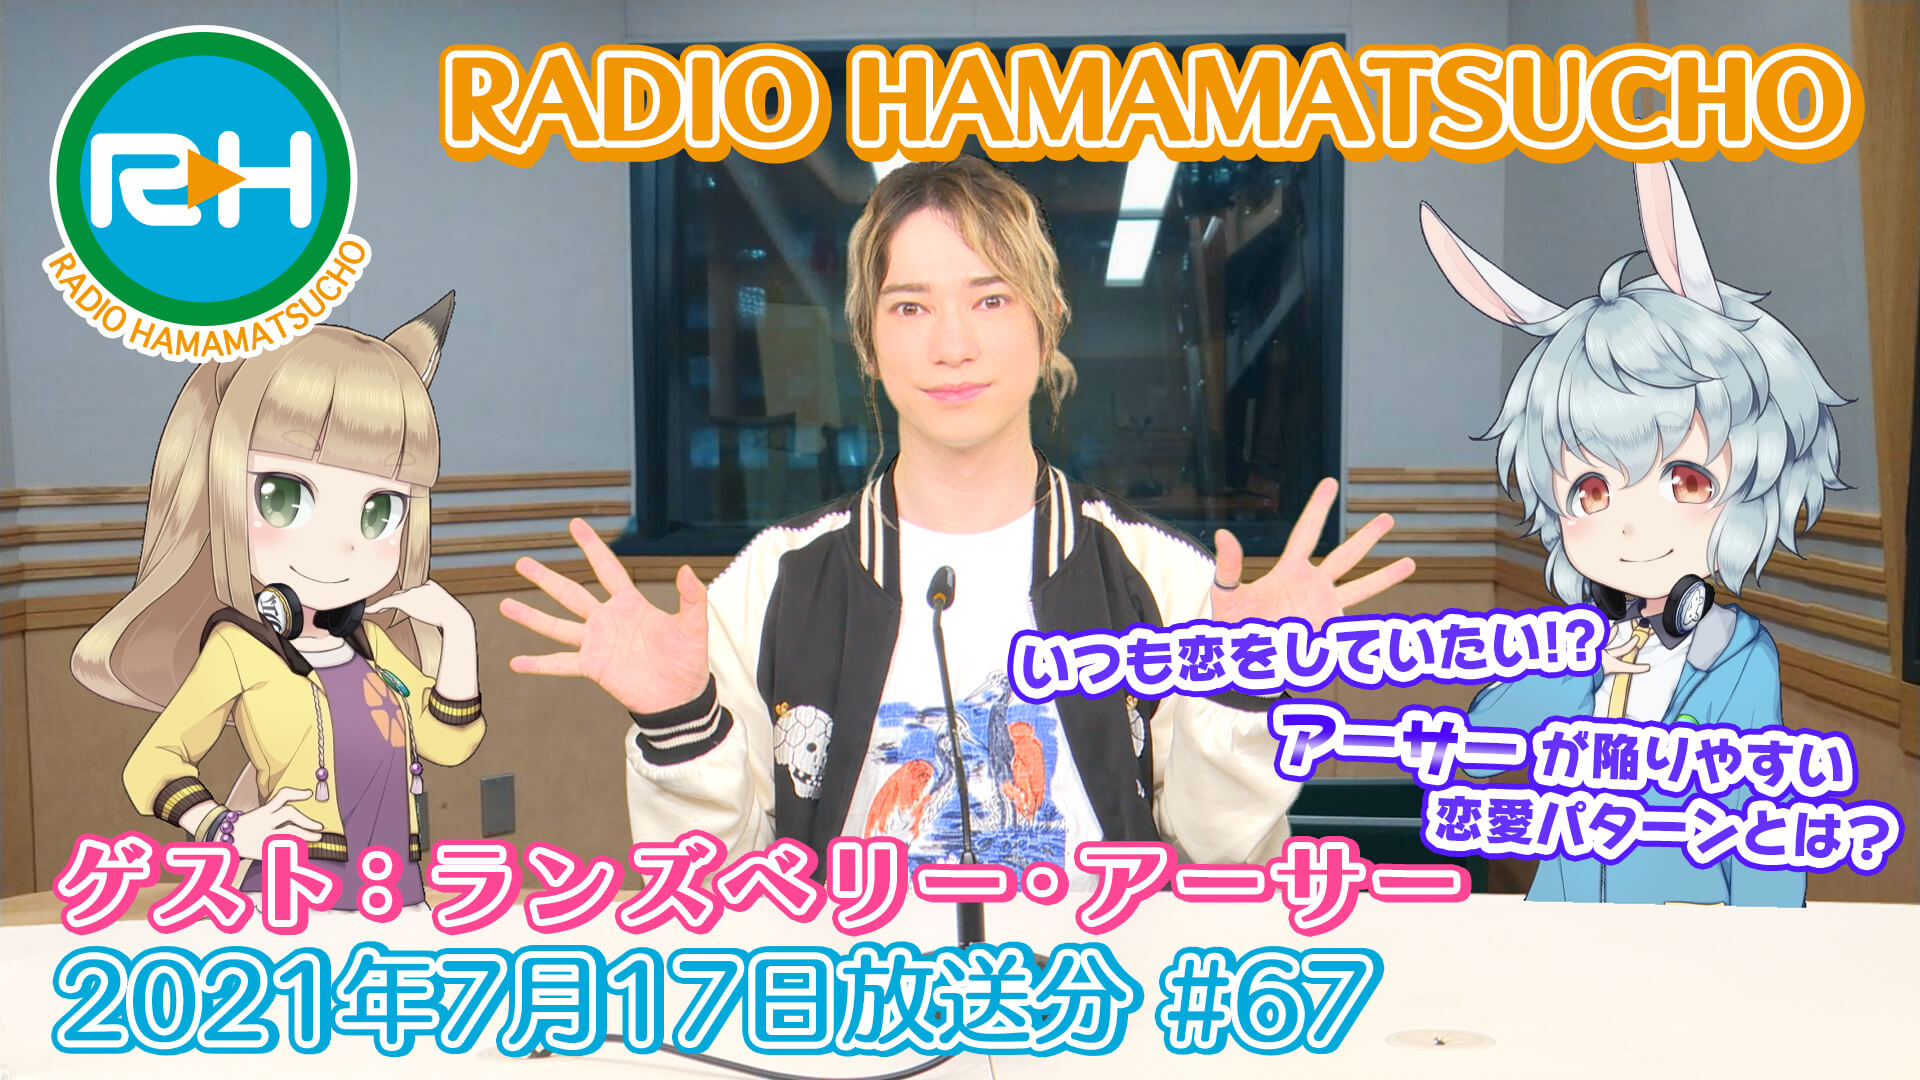 RADIO HAMAMATSUCHO 第67回 (2021年7月17日放送分) ゲスト: ランズベリー・アーサー